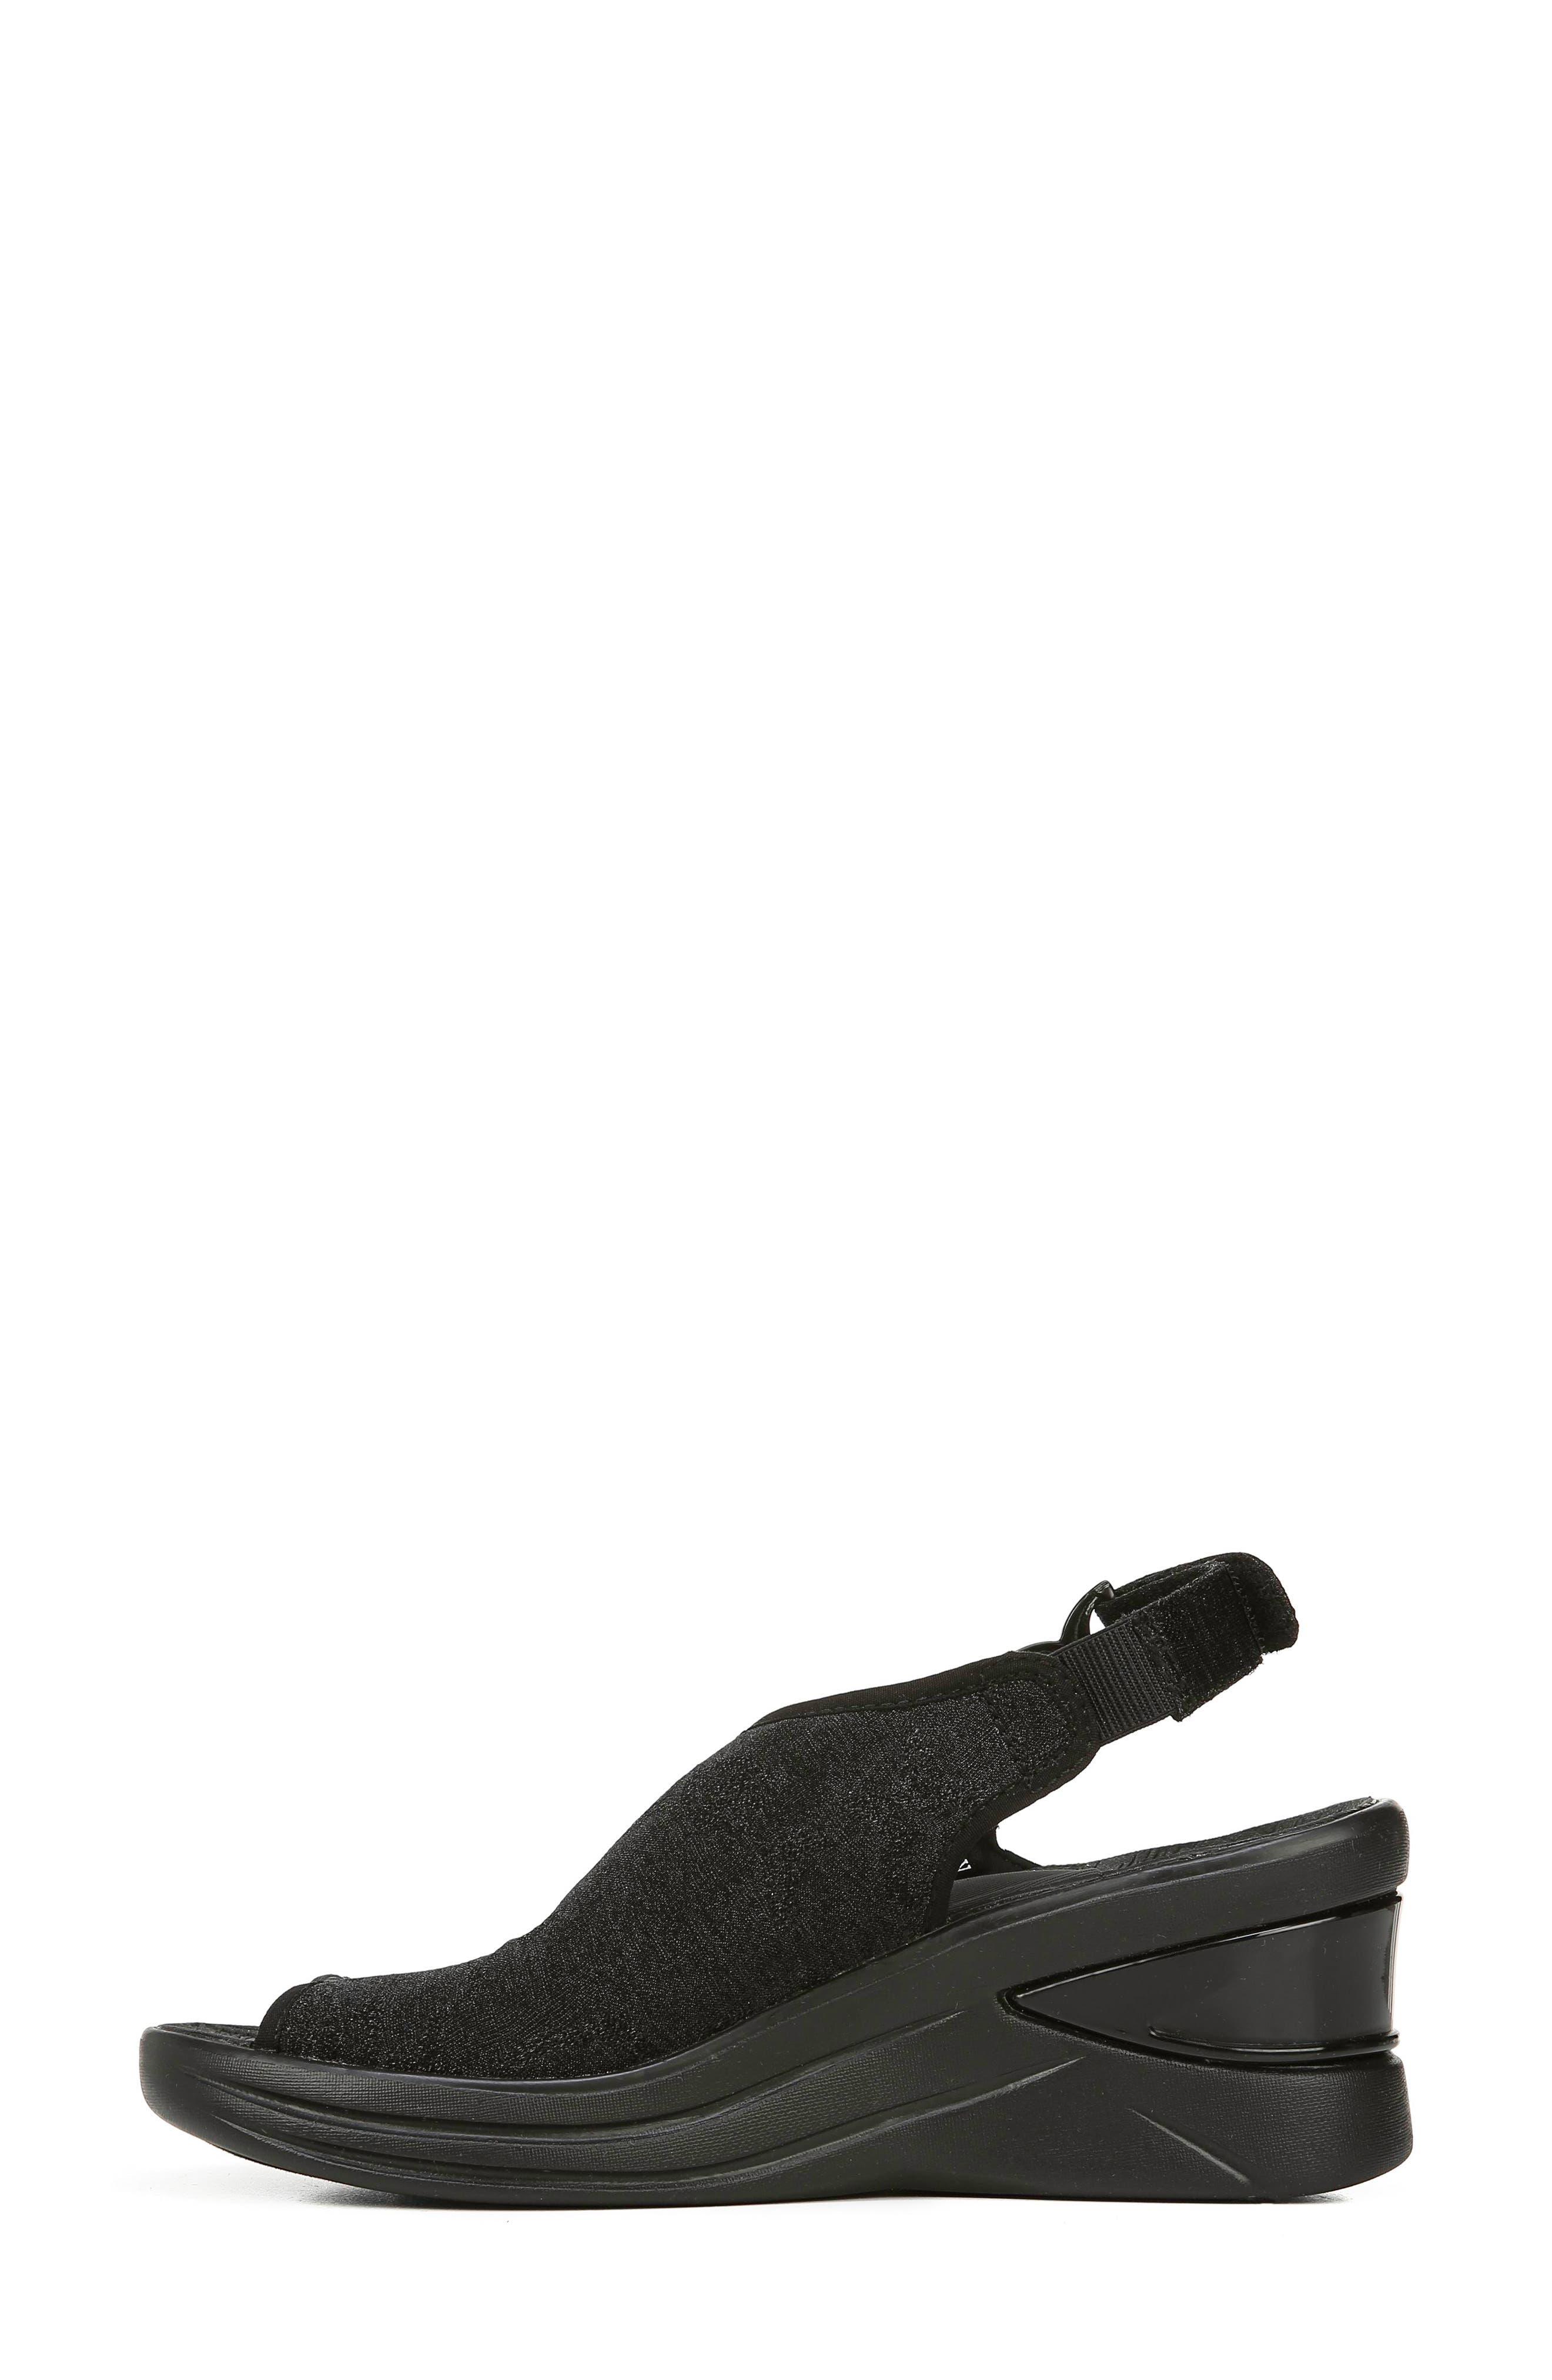 BZEES, Vivia Slingback Wedge Sandal, Alternate thumbnail 9, color, BLACK FABRIC